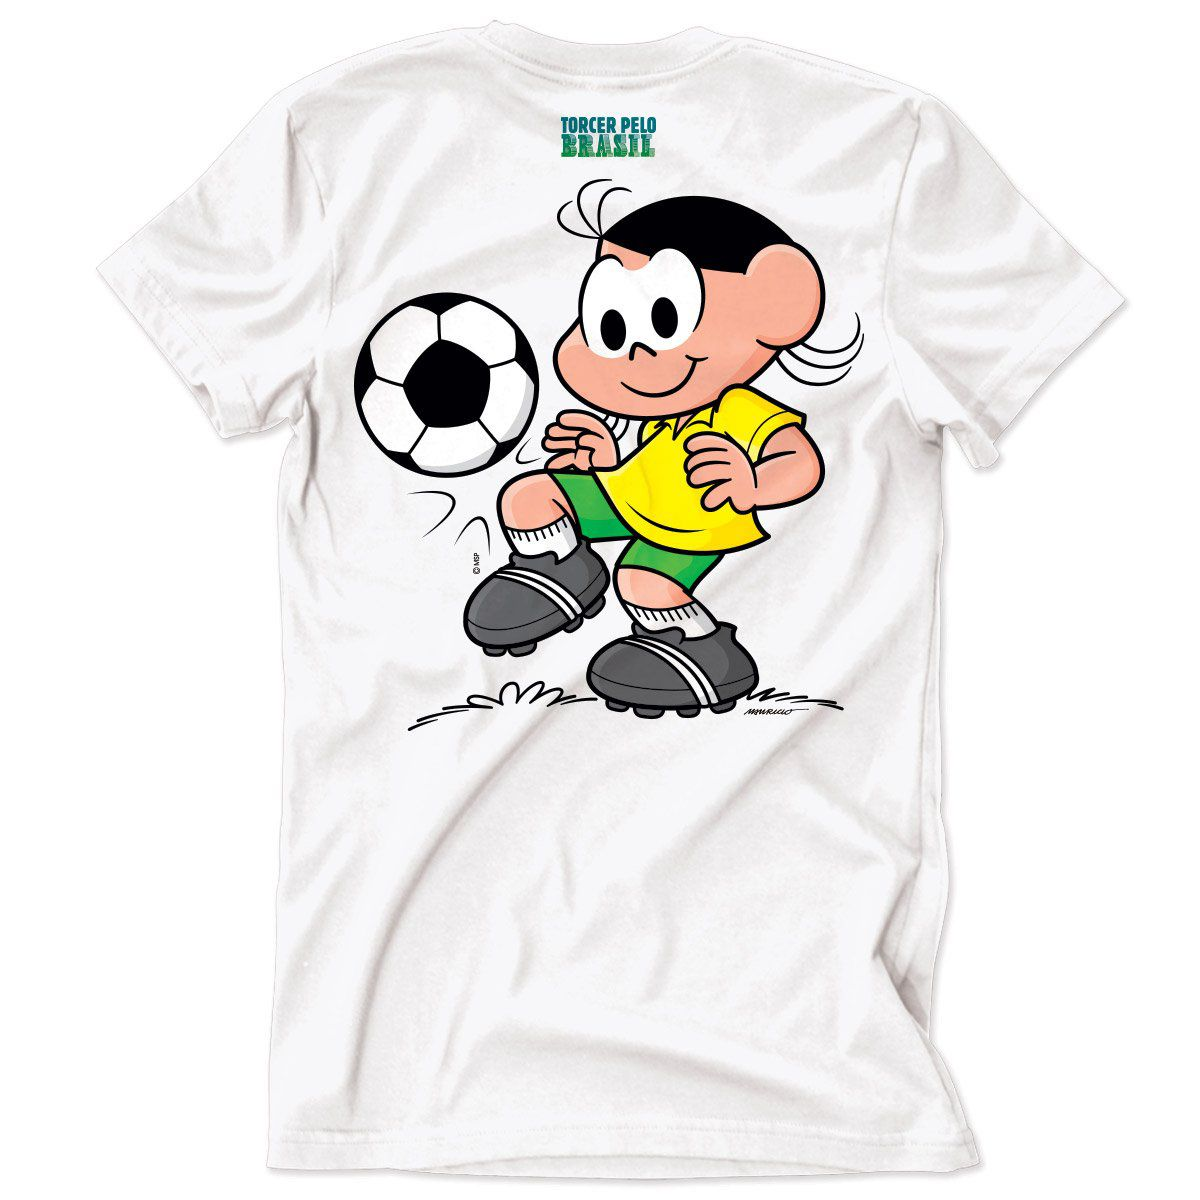 Camiseta Turma da Mônica Jogadora Magali